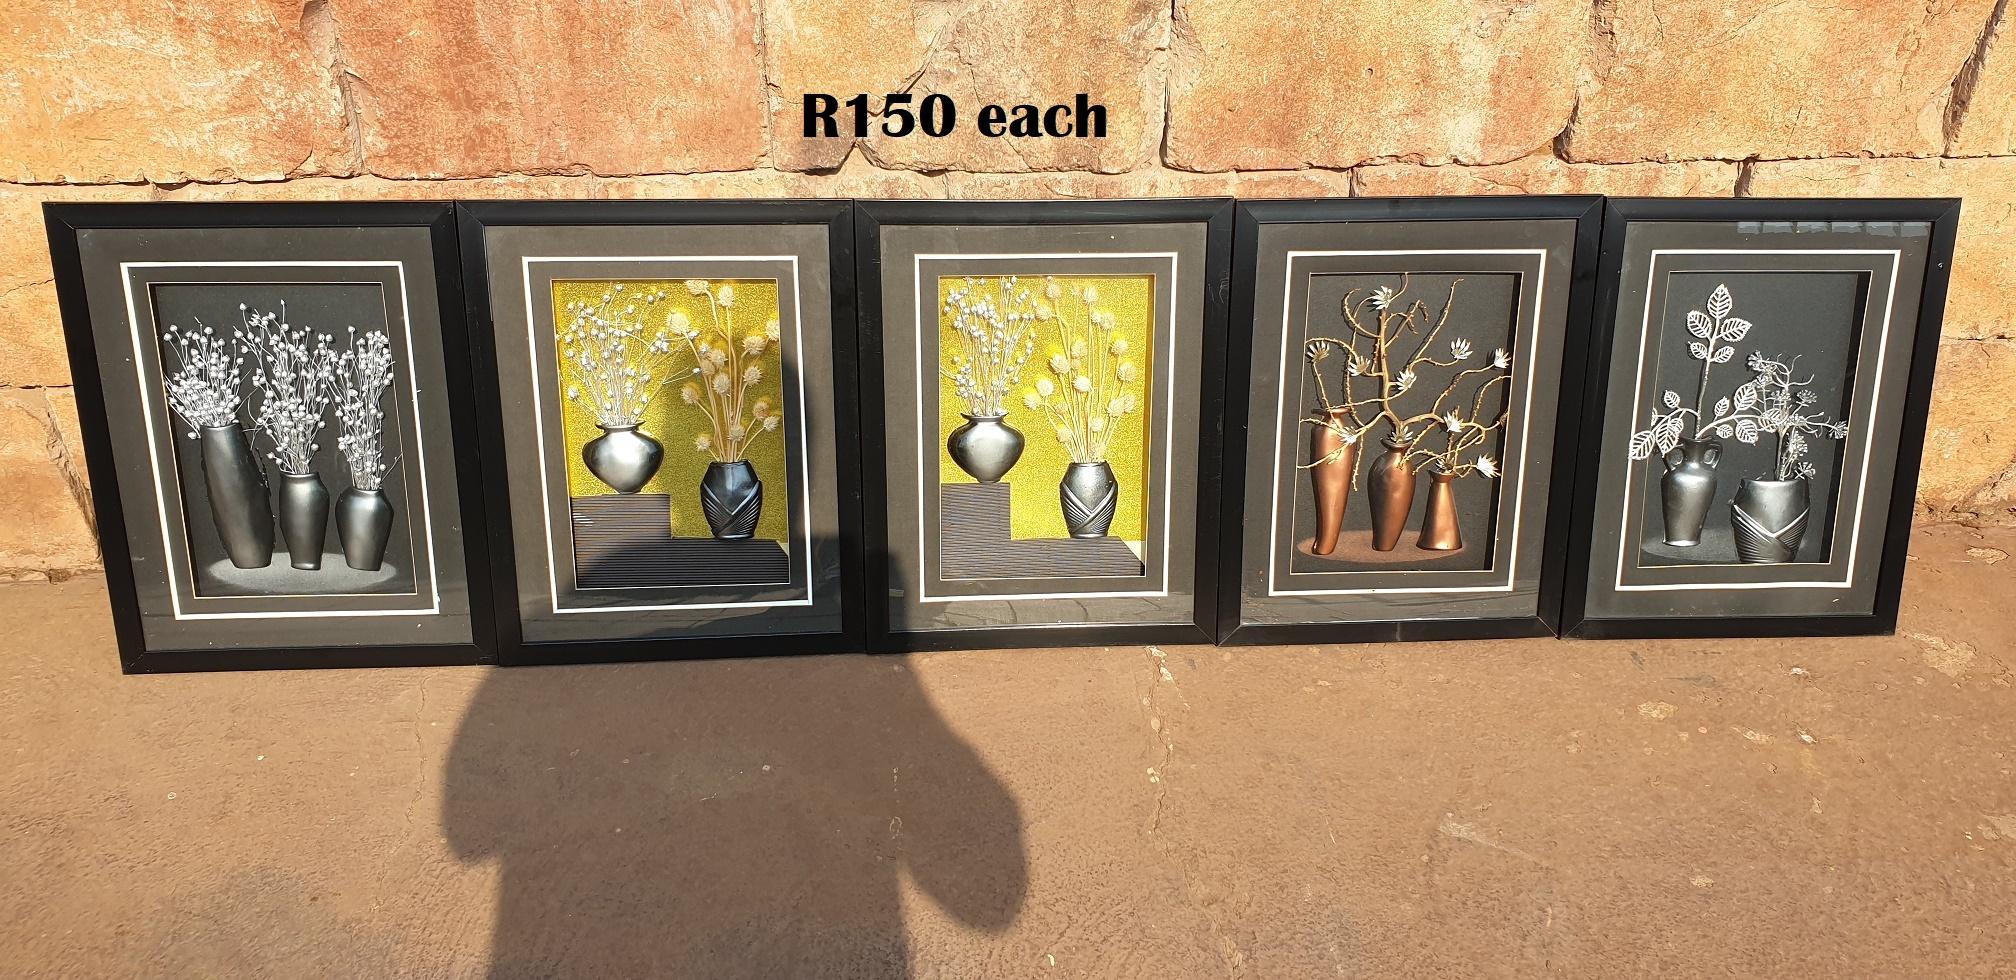 3D Framed Wall Hangings (425x540) EACH R150